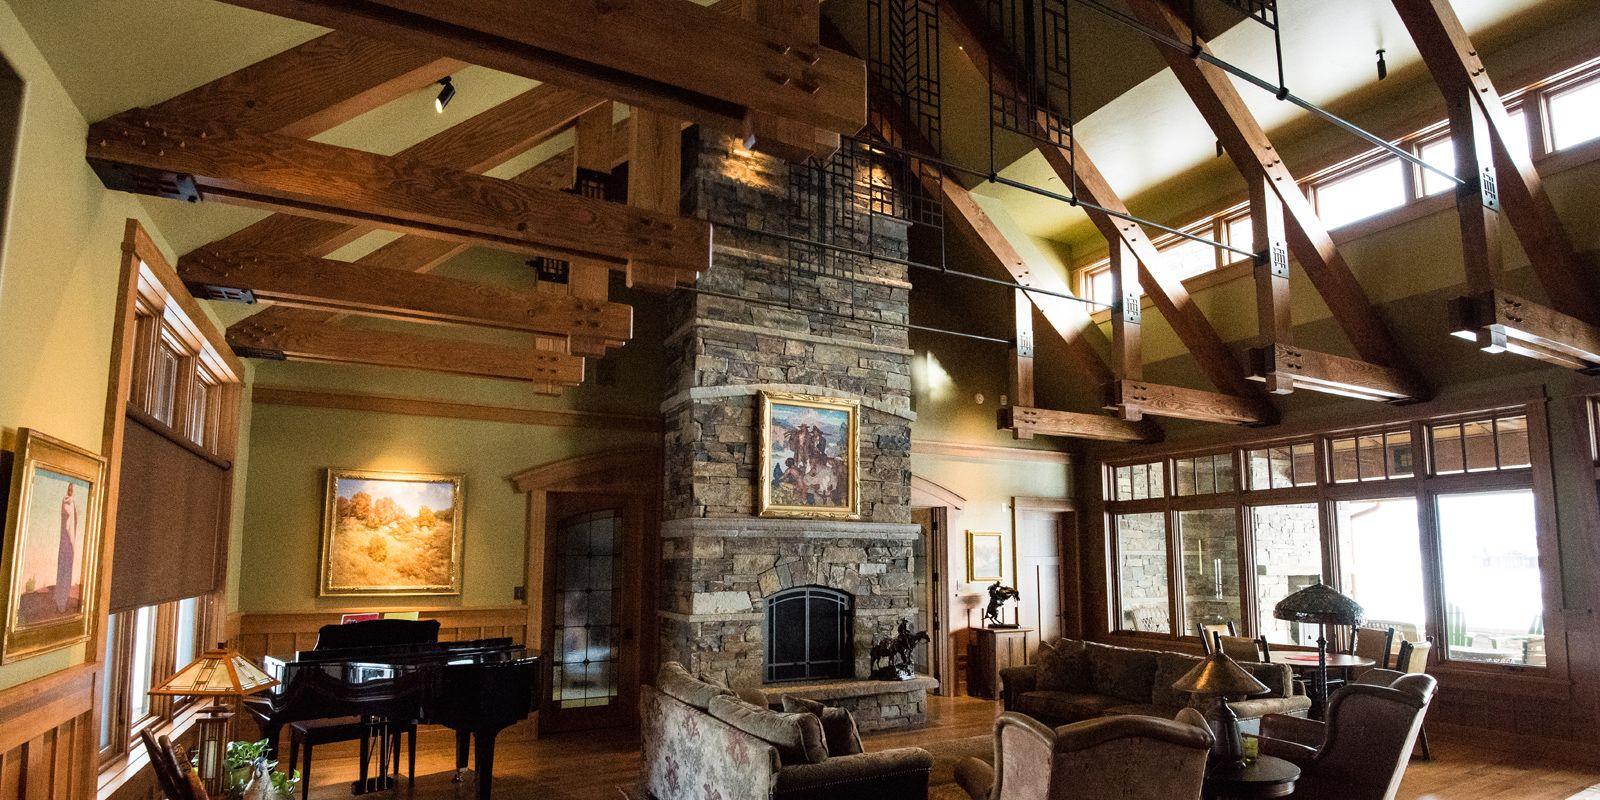 Craftsman Style Interior In A Mountain Home Mountain